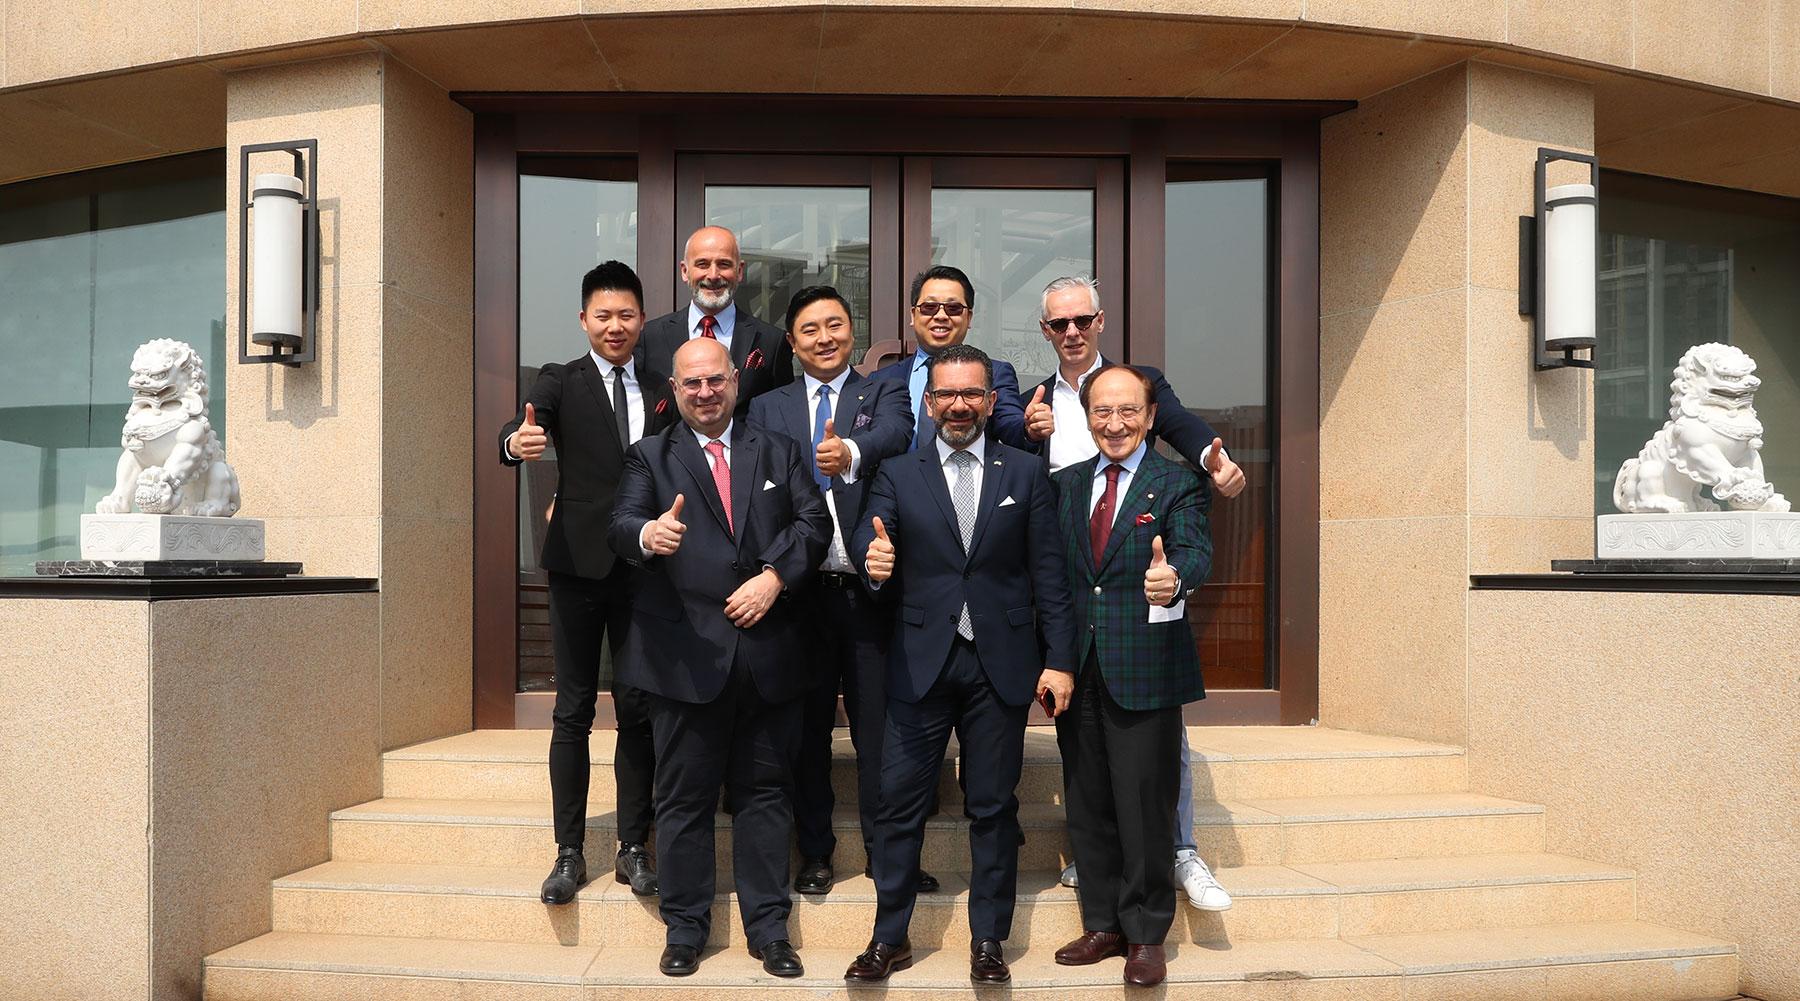 Opengate China insieme alla provincia di Padova